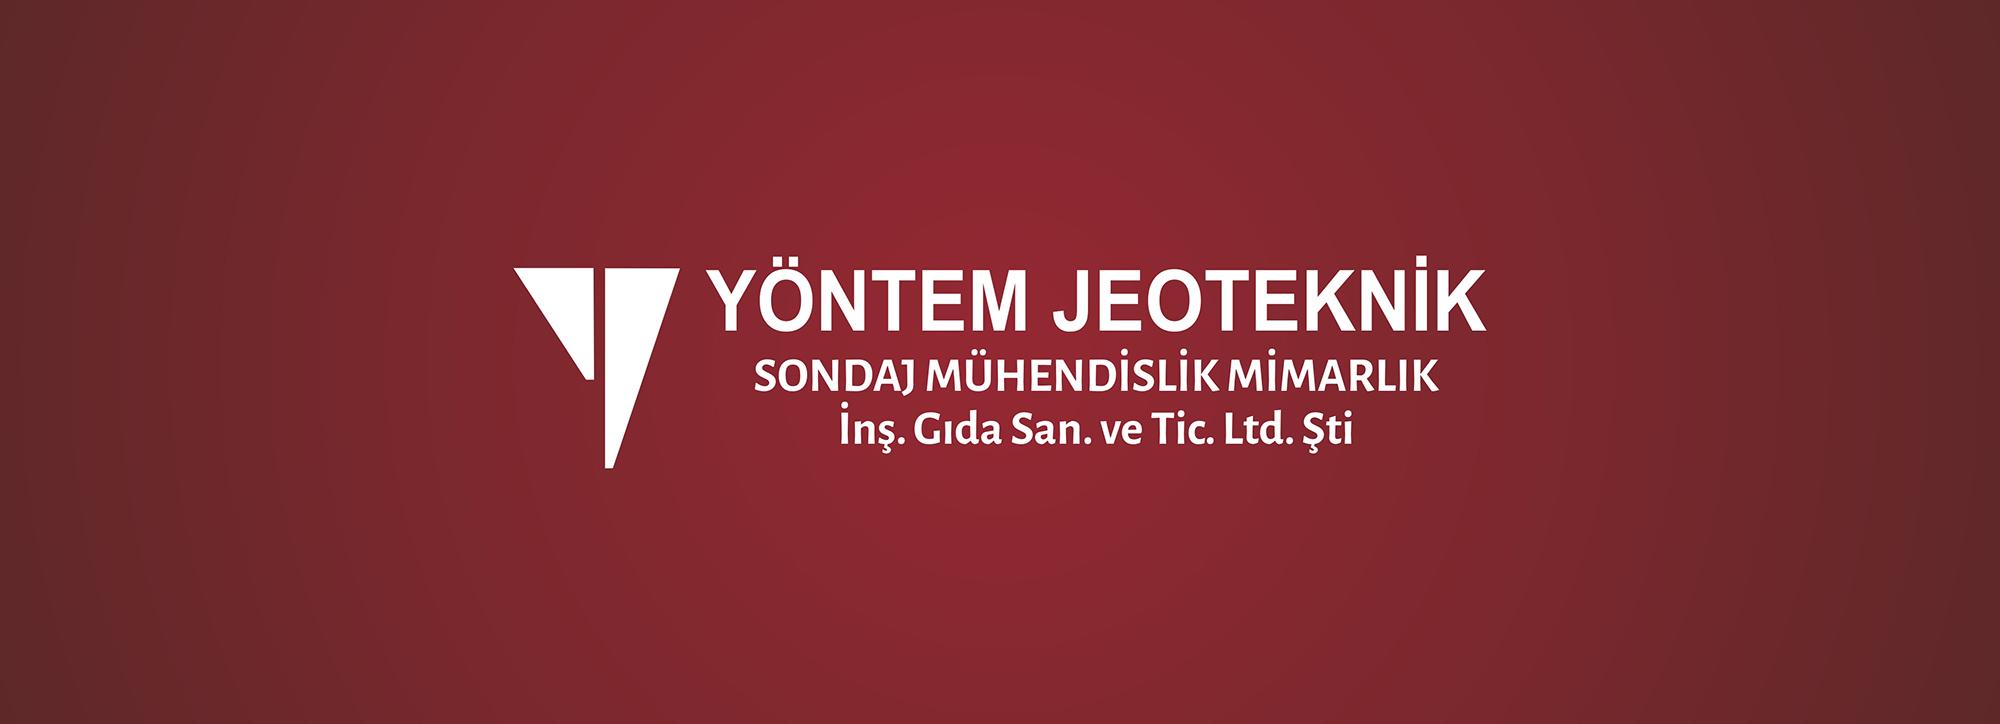 yontemjeoteknik.com